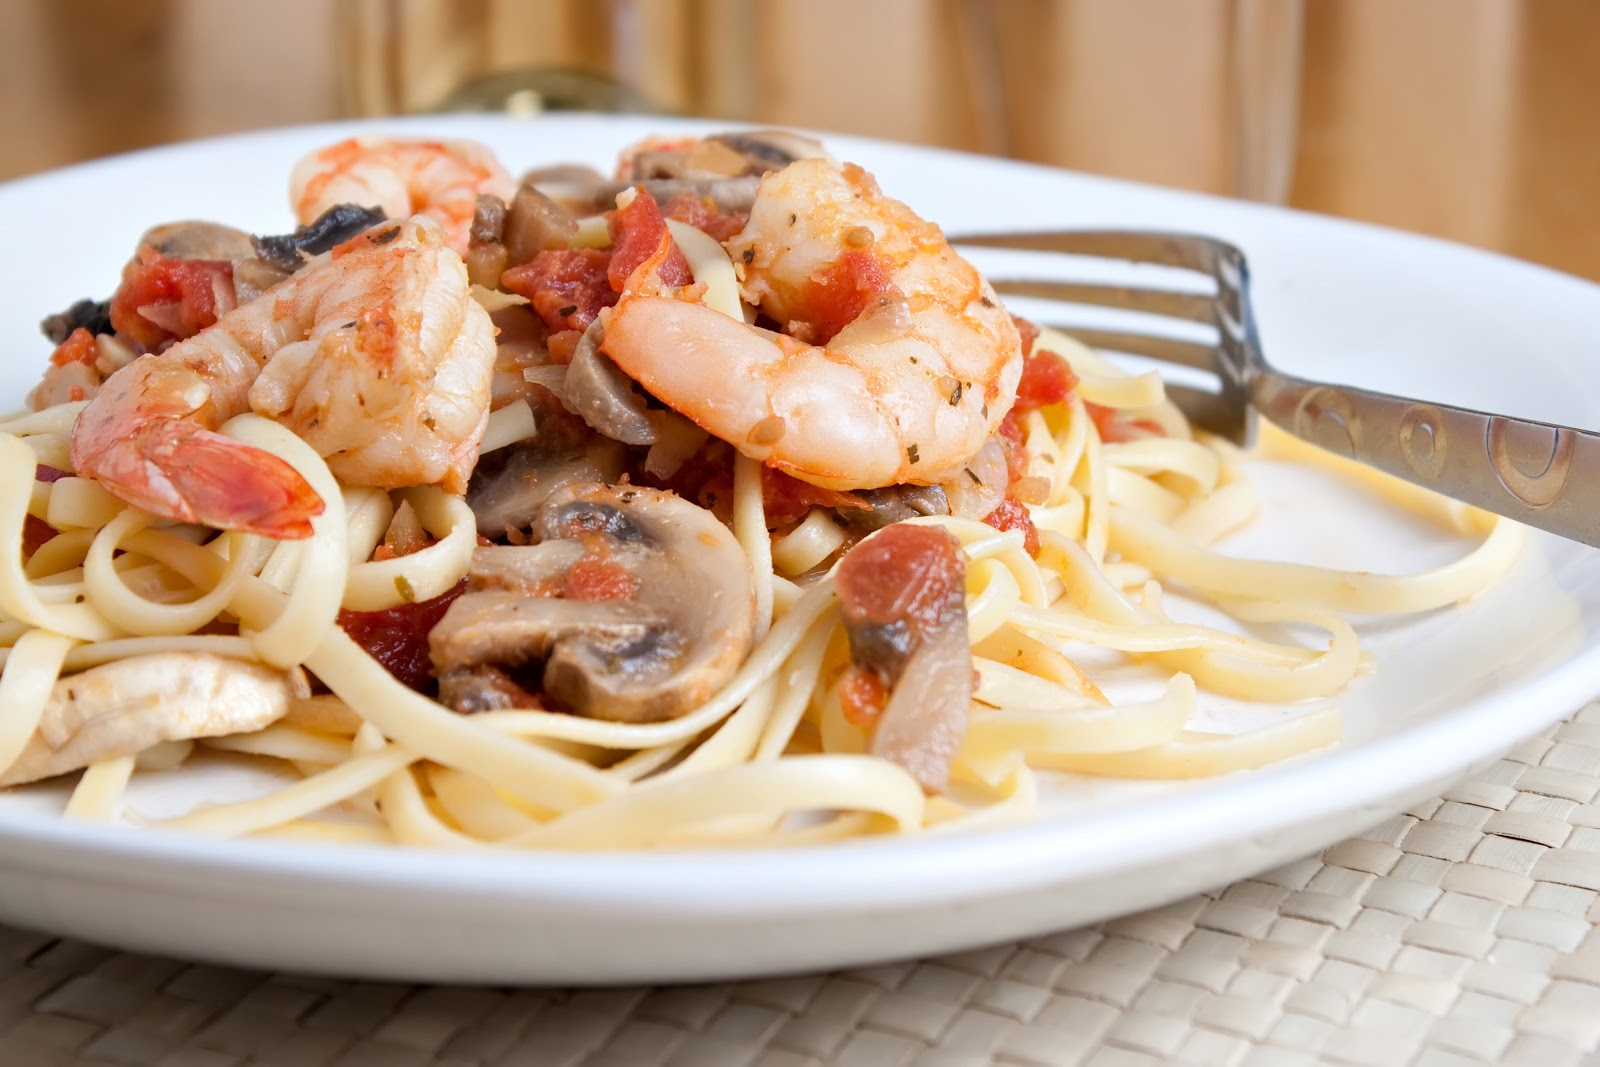 Orange County Mom Blog: Champagne Shrimp and Angel Hair Pasta Recipe